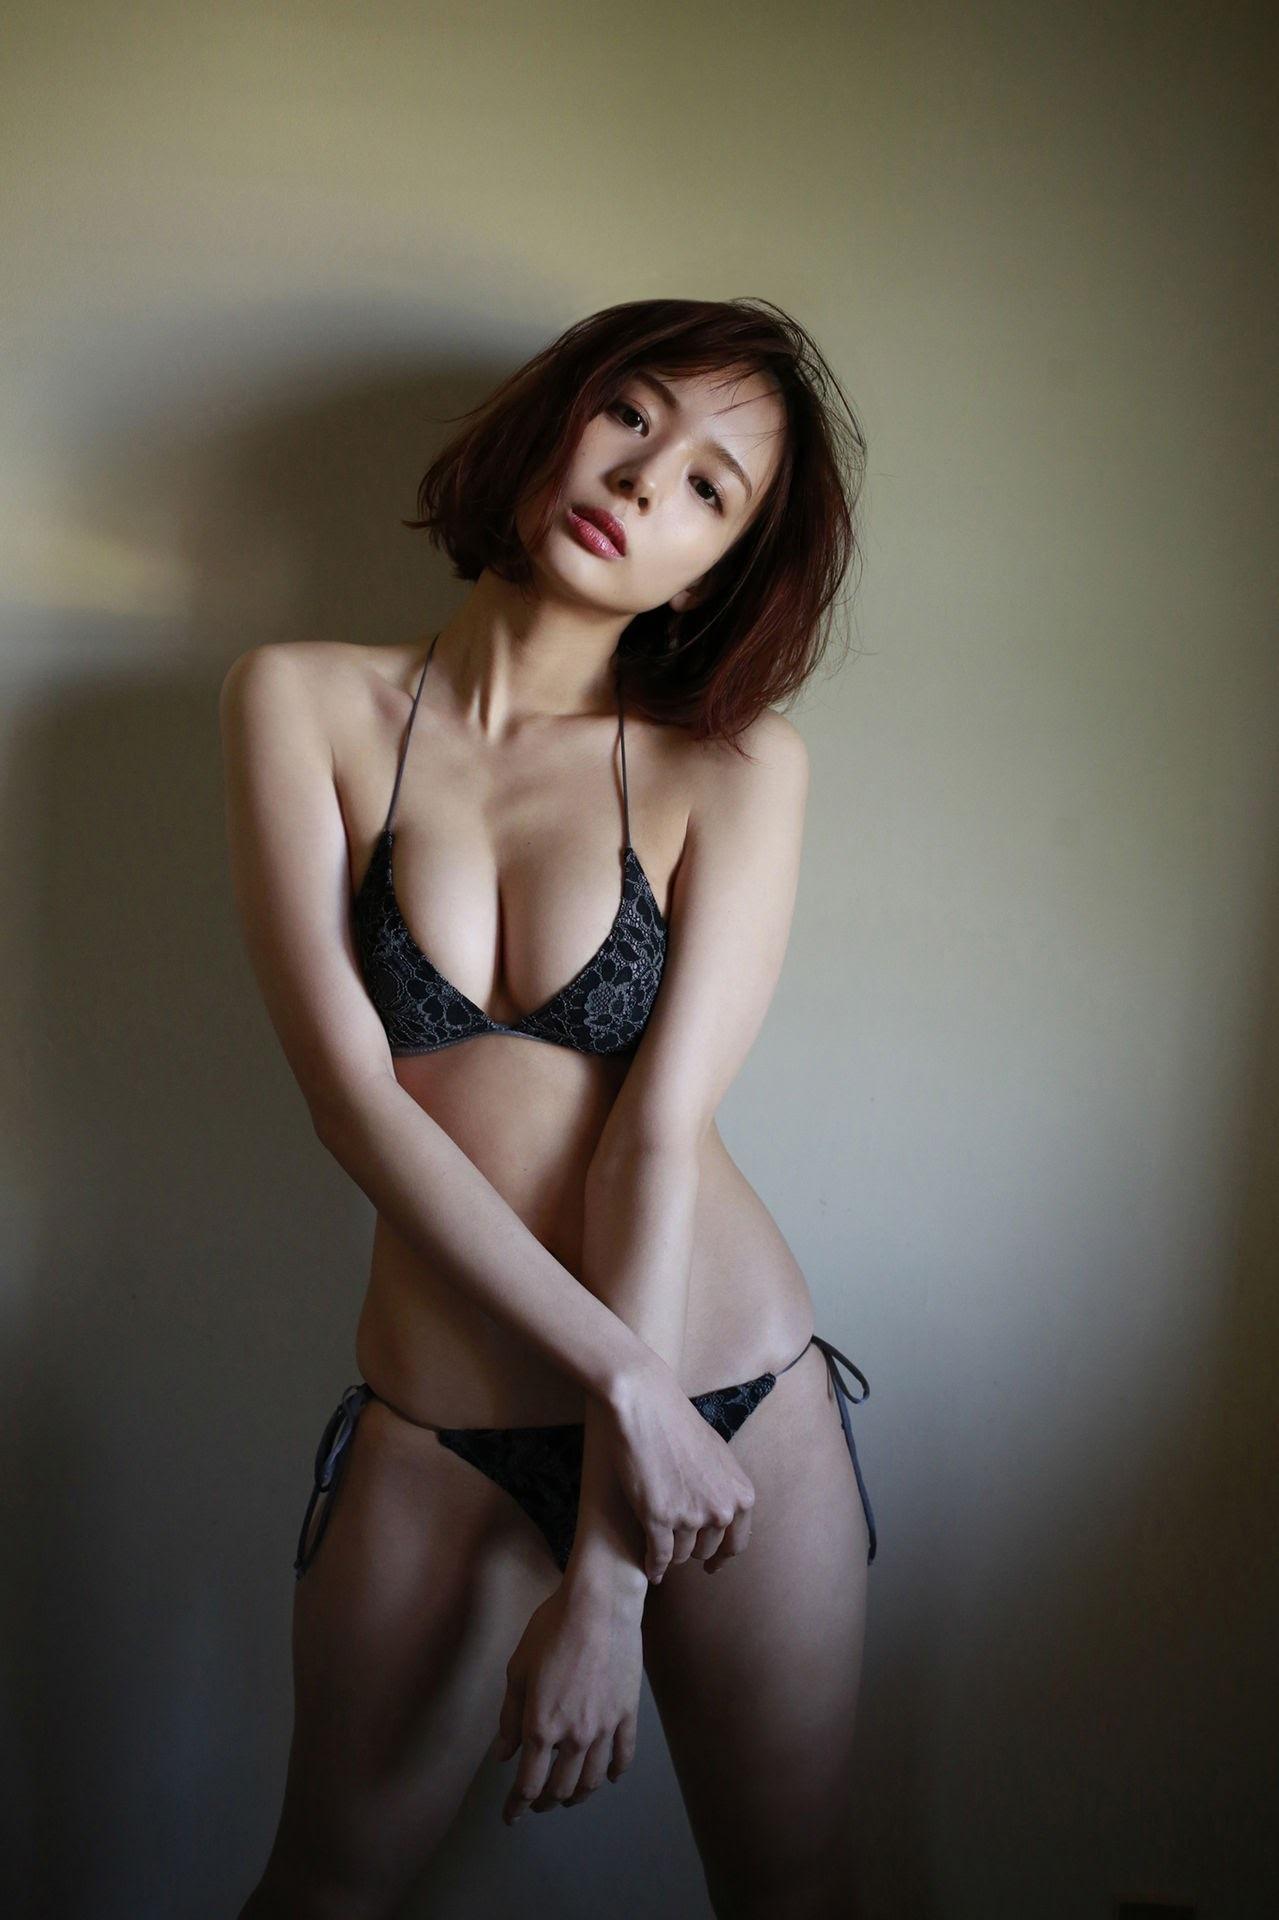 23 years old Shaka Okada, who is also a professional mahjong player070